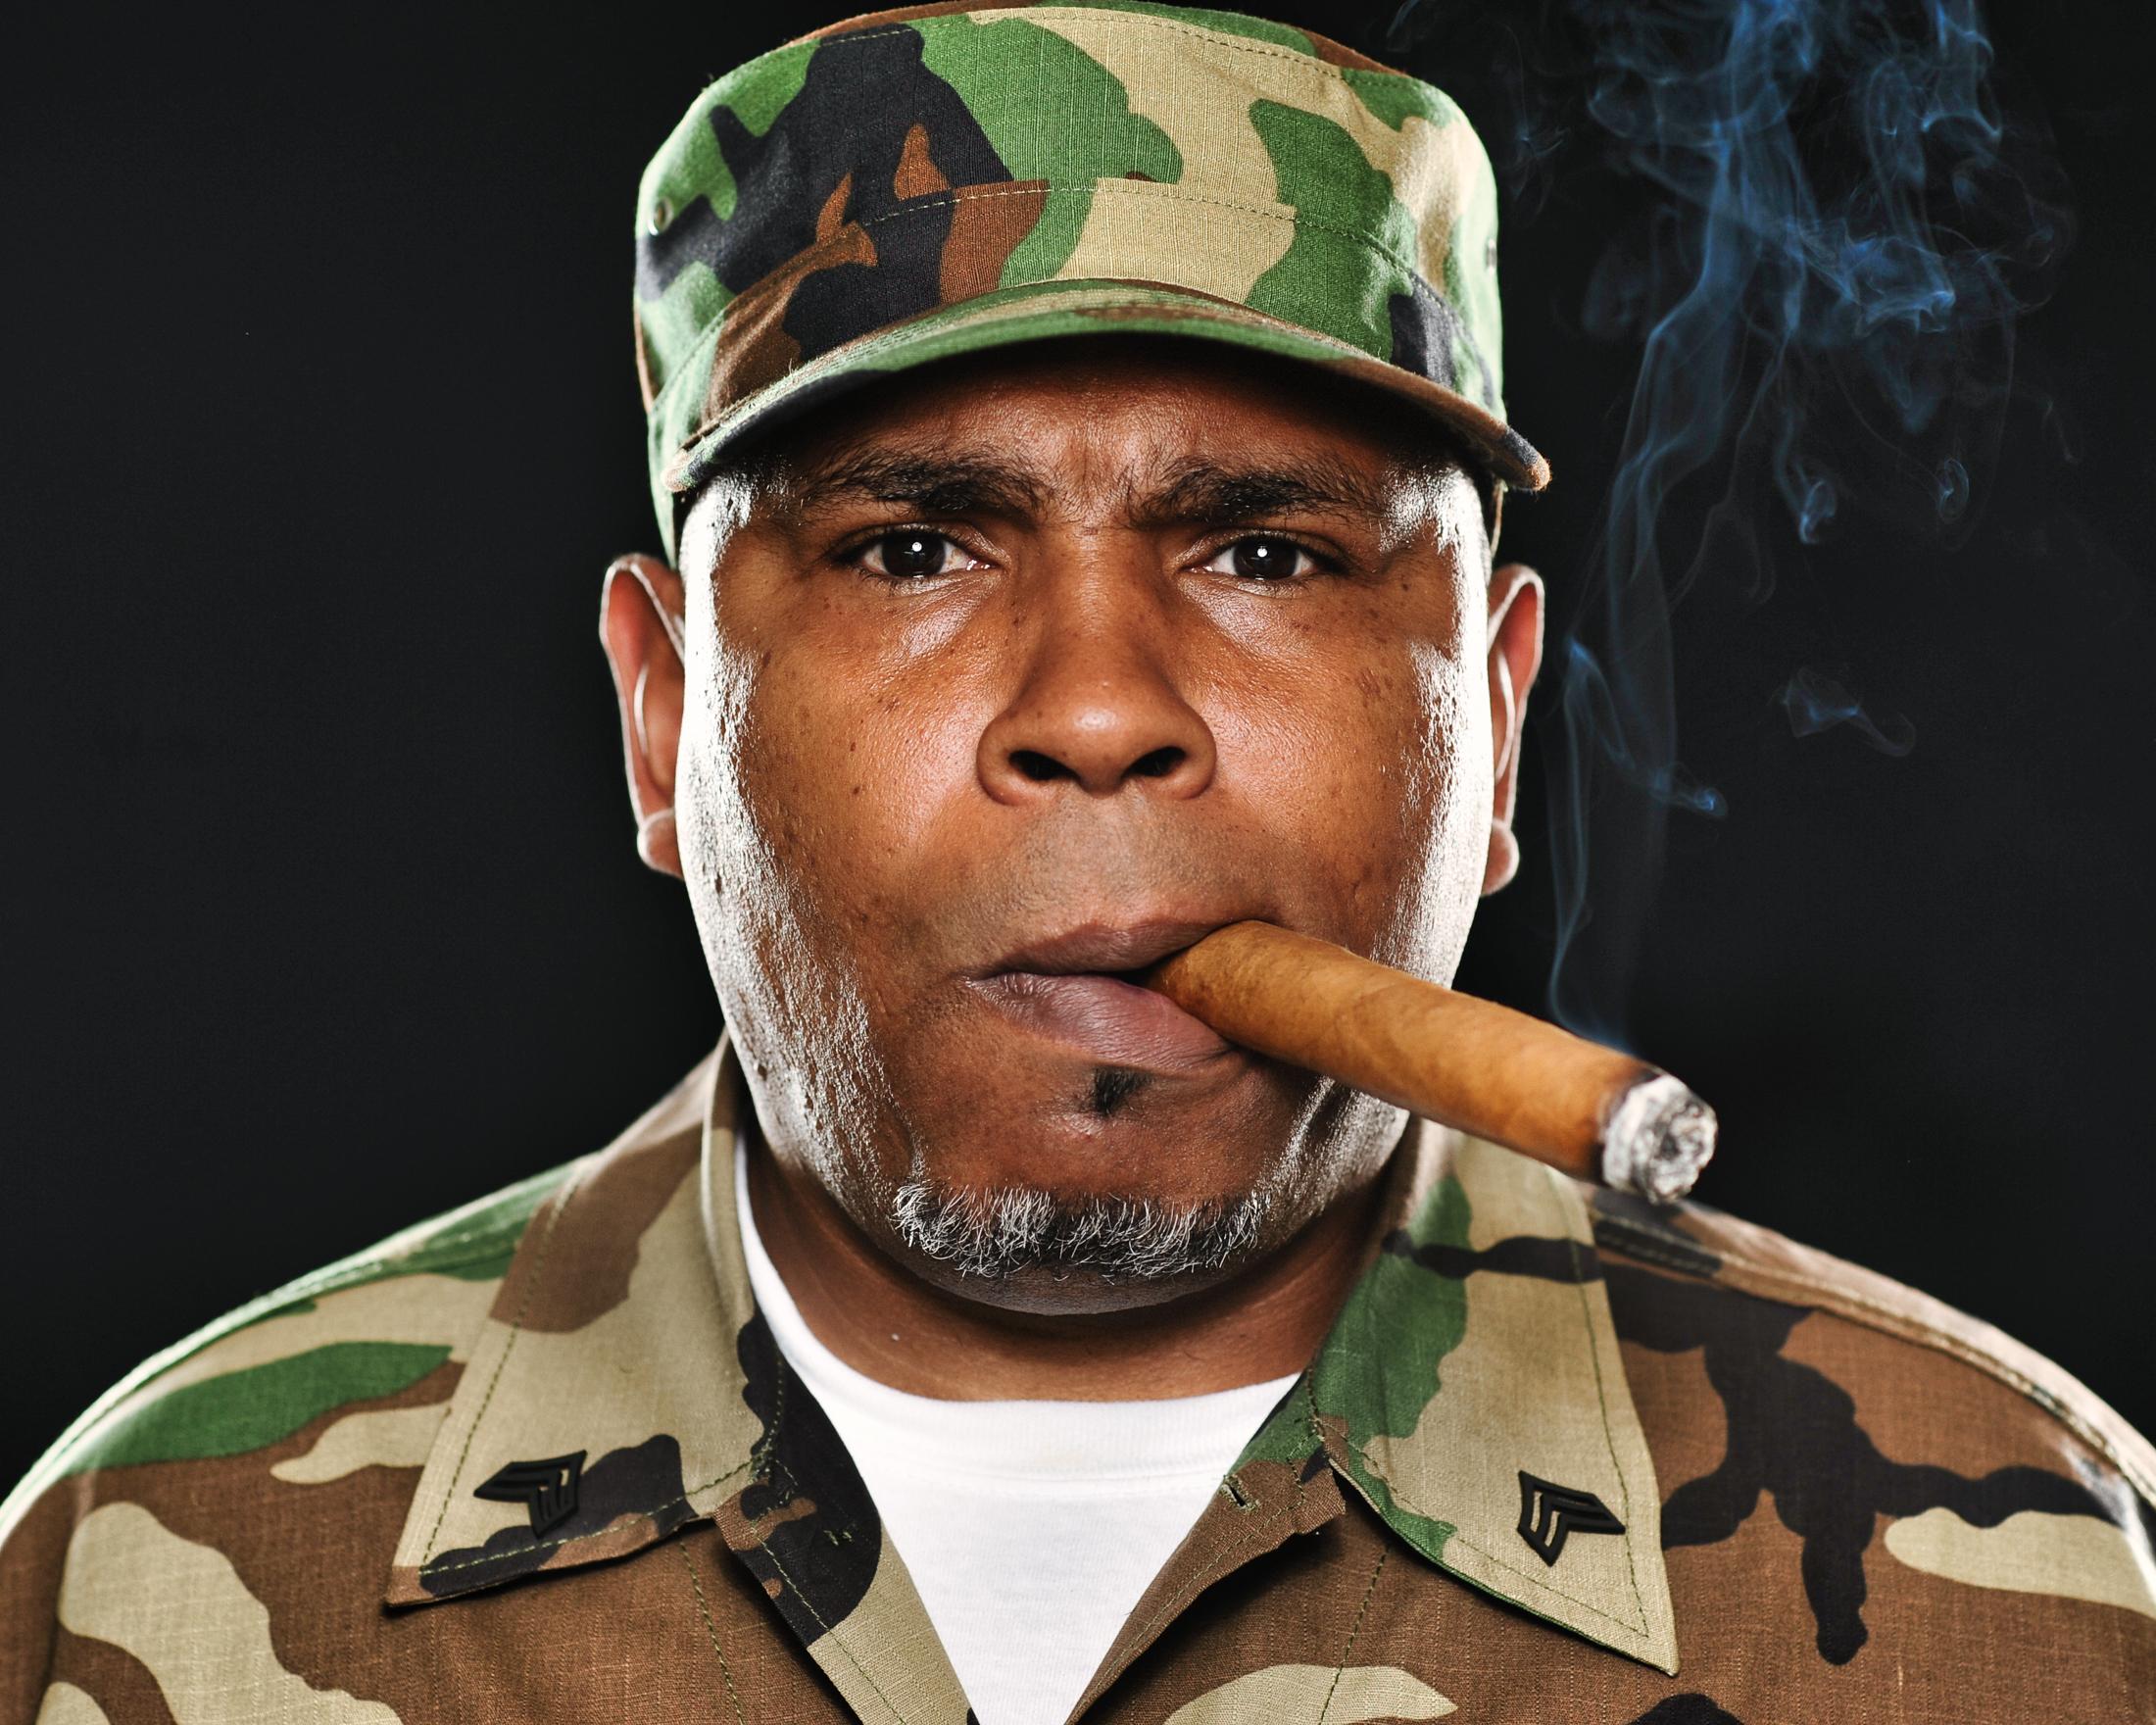 Corporal Ramos by Will Crockett